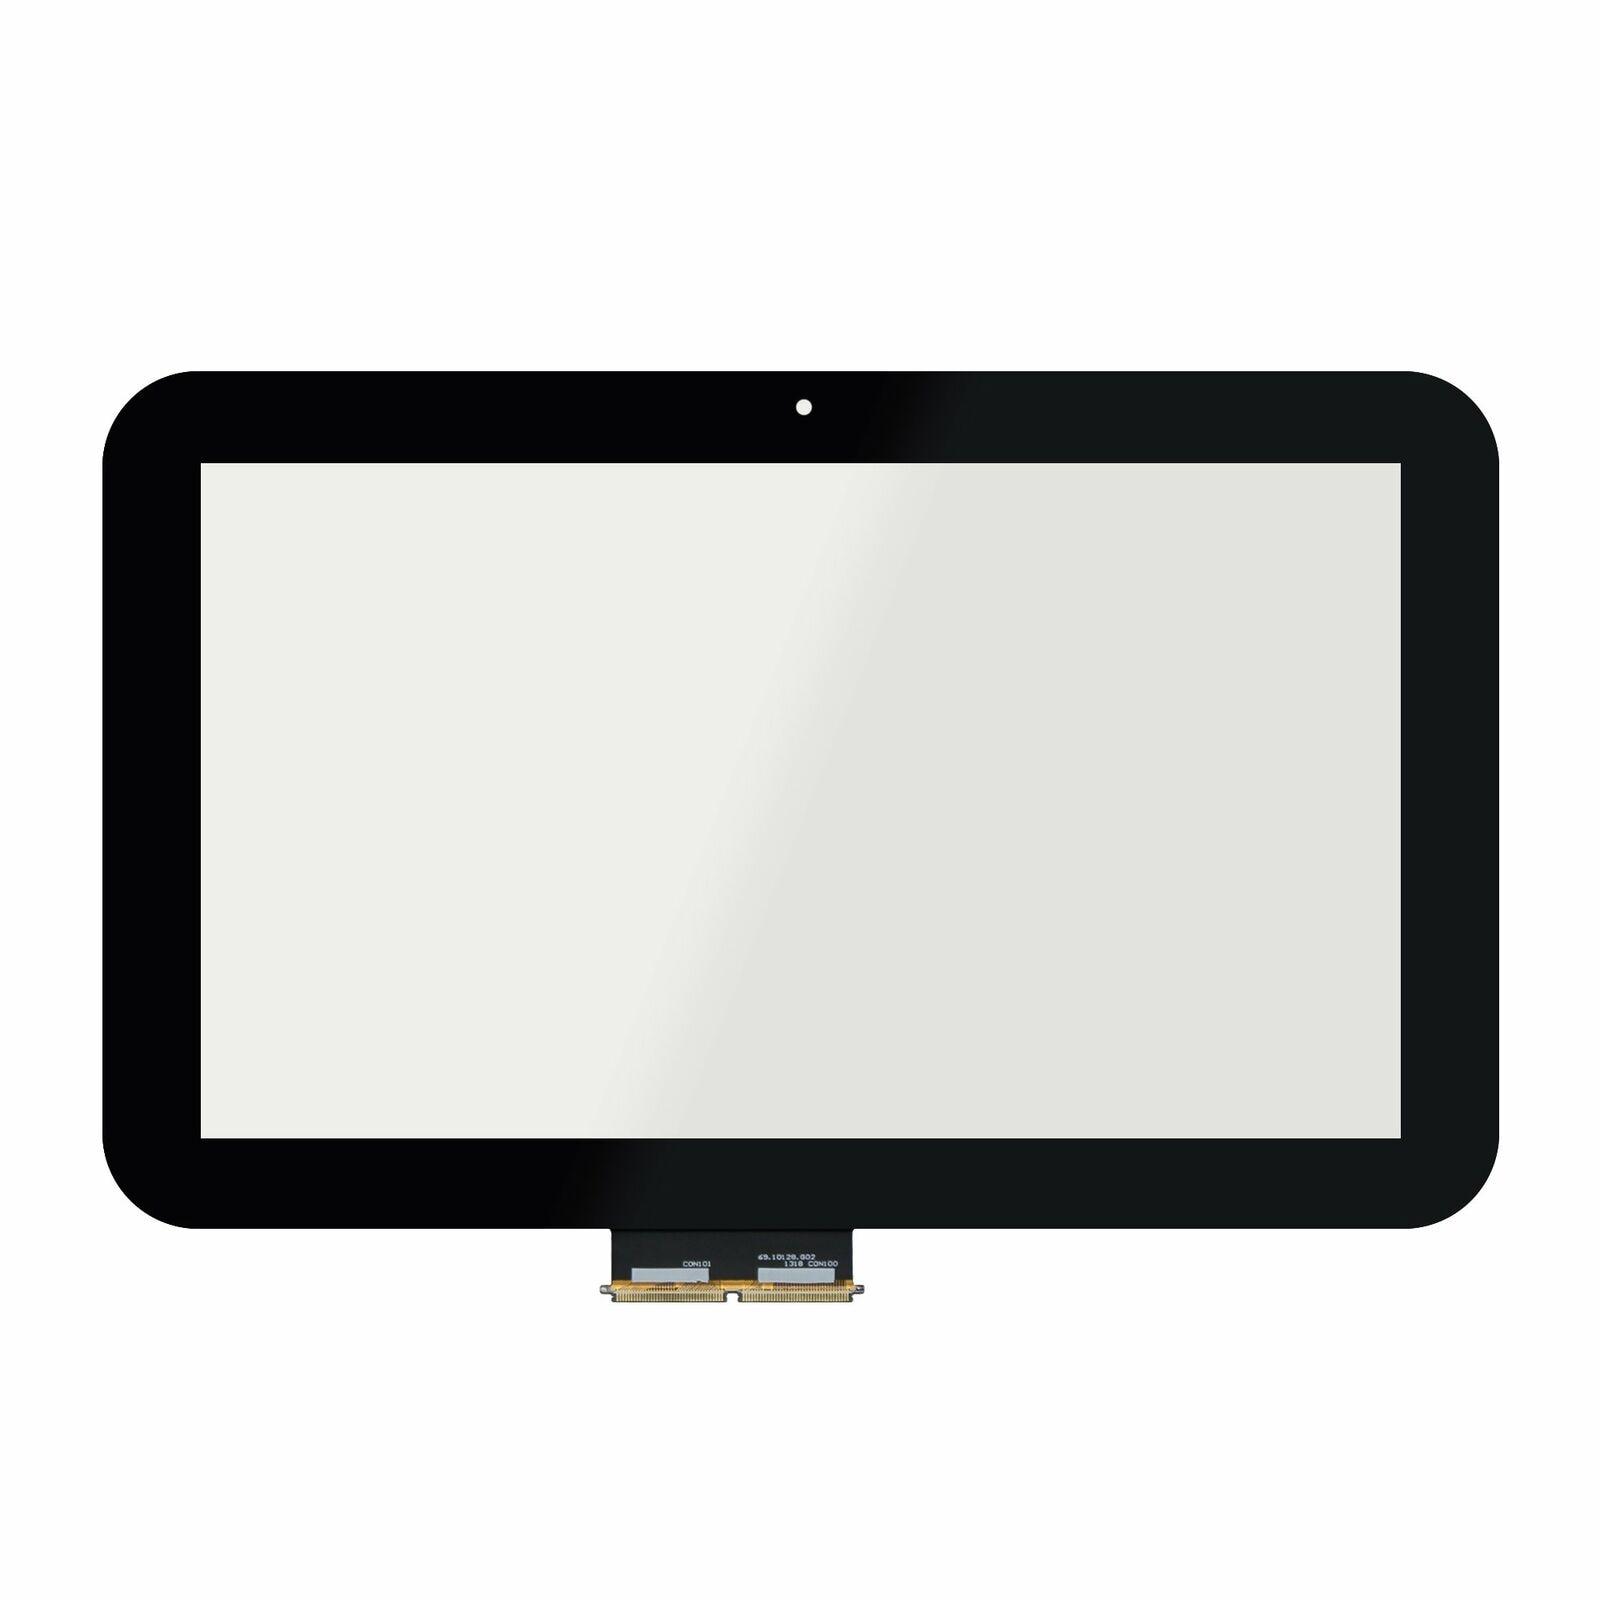 For Toshiba Excite Pad AT10 AT10-A-104 AT10LE-A-109 AT10LE-A-108 69.10128.G02 Touch Screen Digitizer Sensor GlassFor Toshiba Excite Pad AT10 AT10-A-104 AT10LE-A-109 AT10LE-A-108 69.10128.G02 Touch Screen Digitizer Sensor Glass